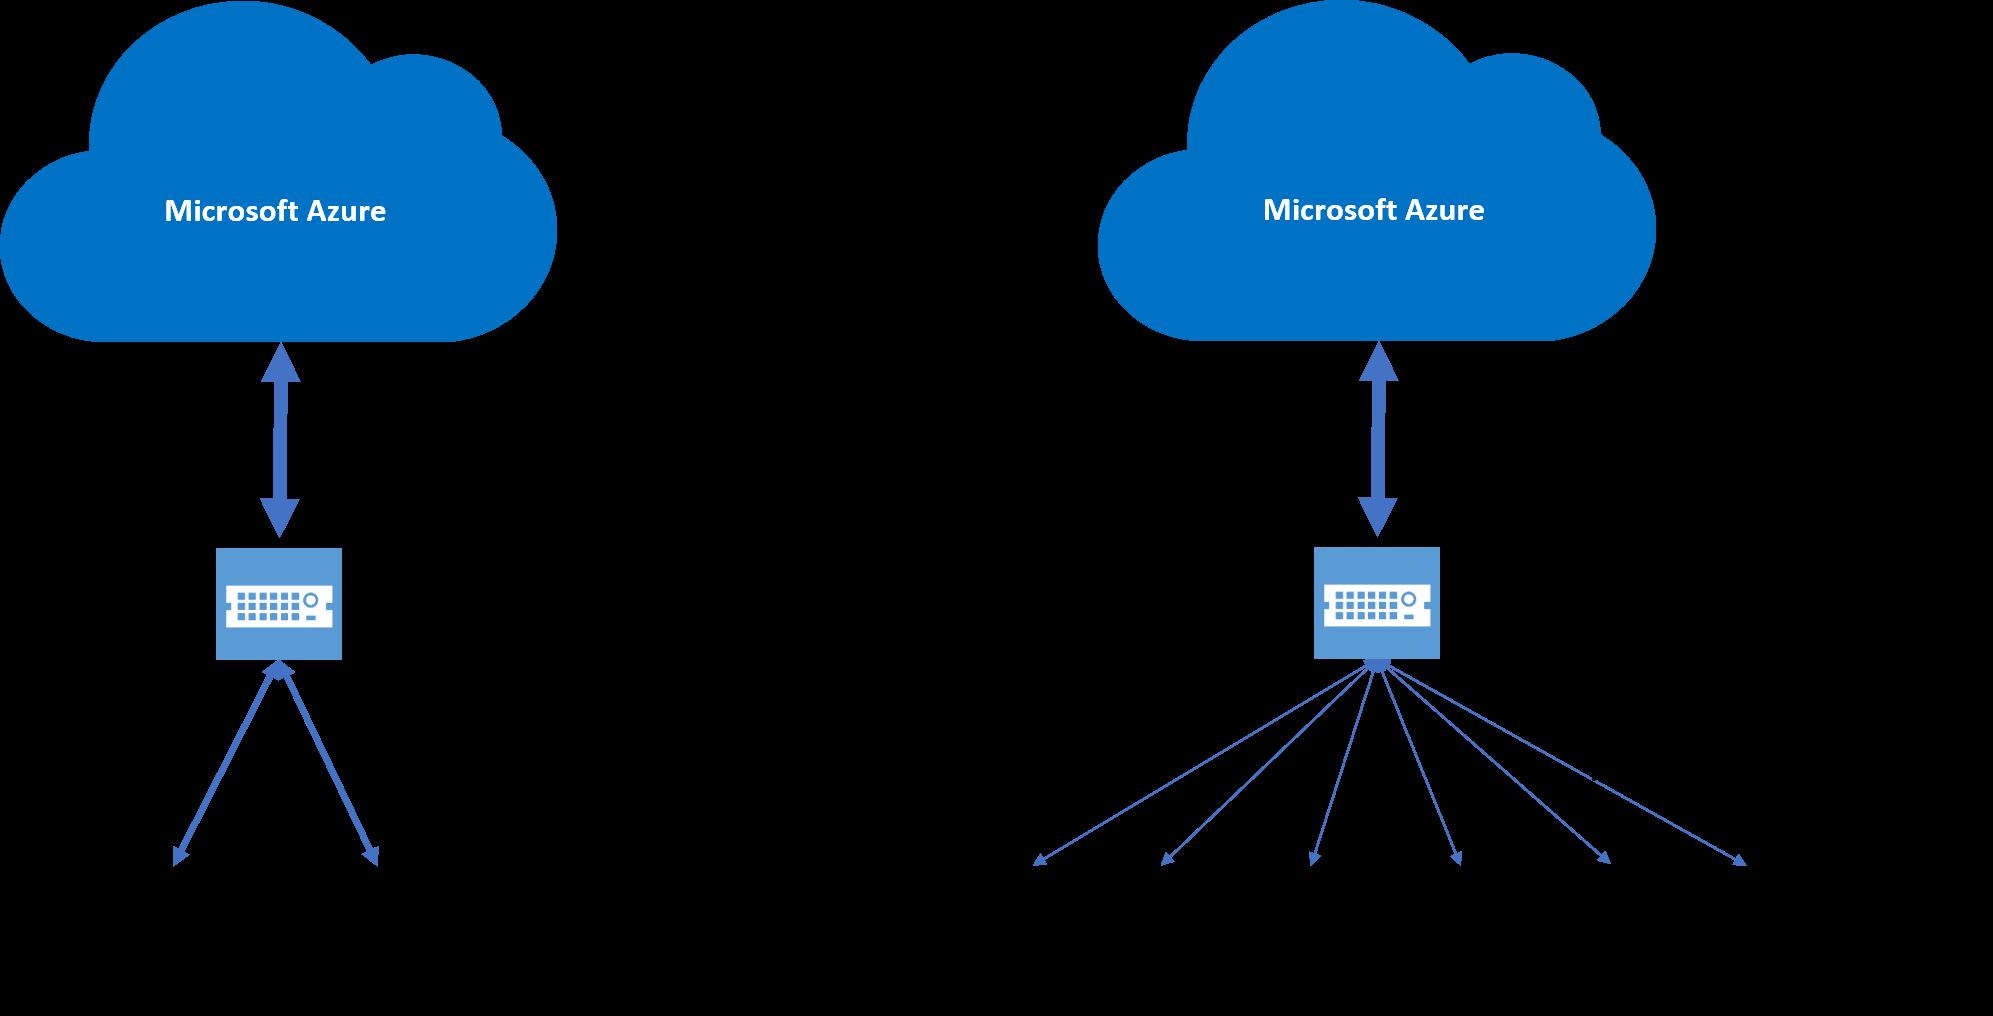 Vpn into azure network